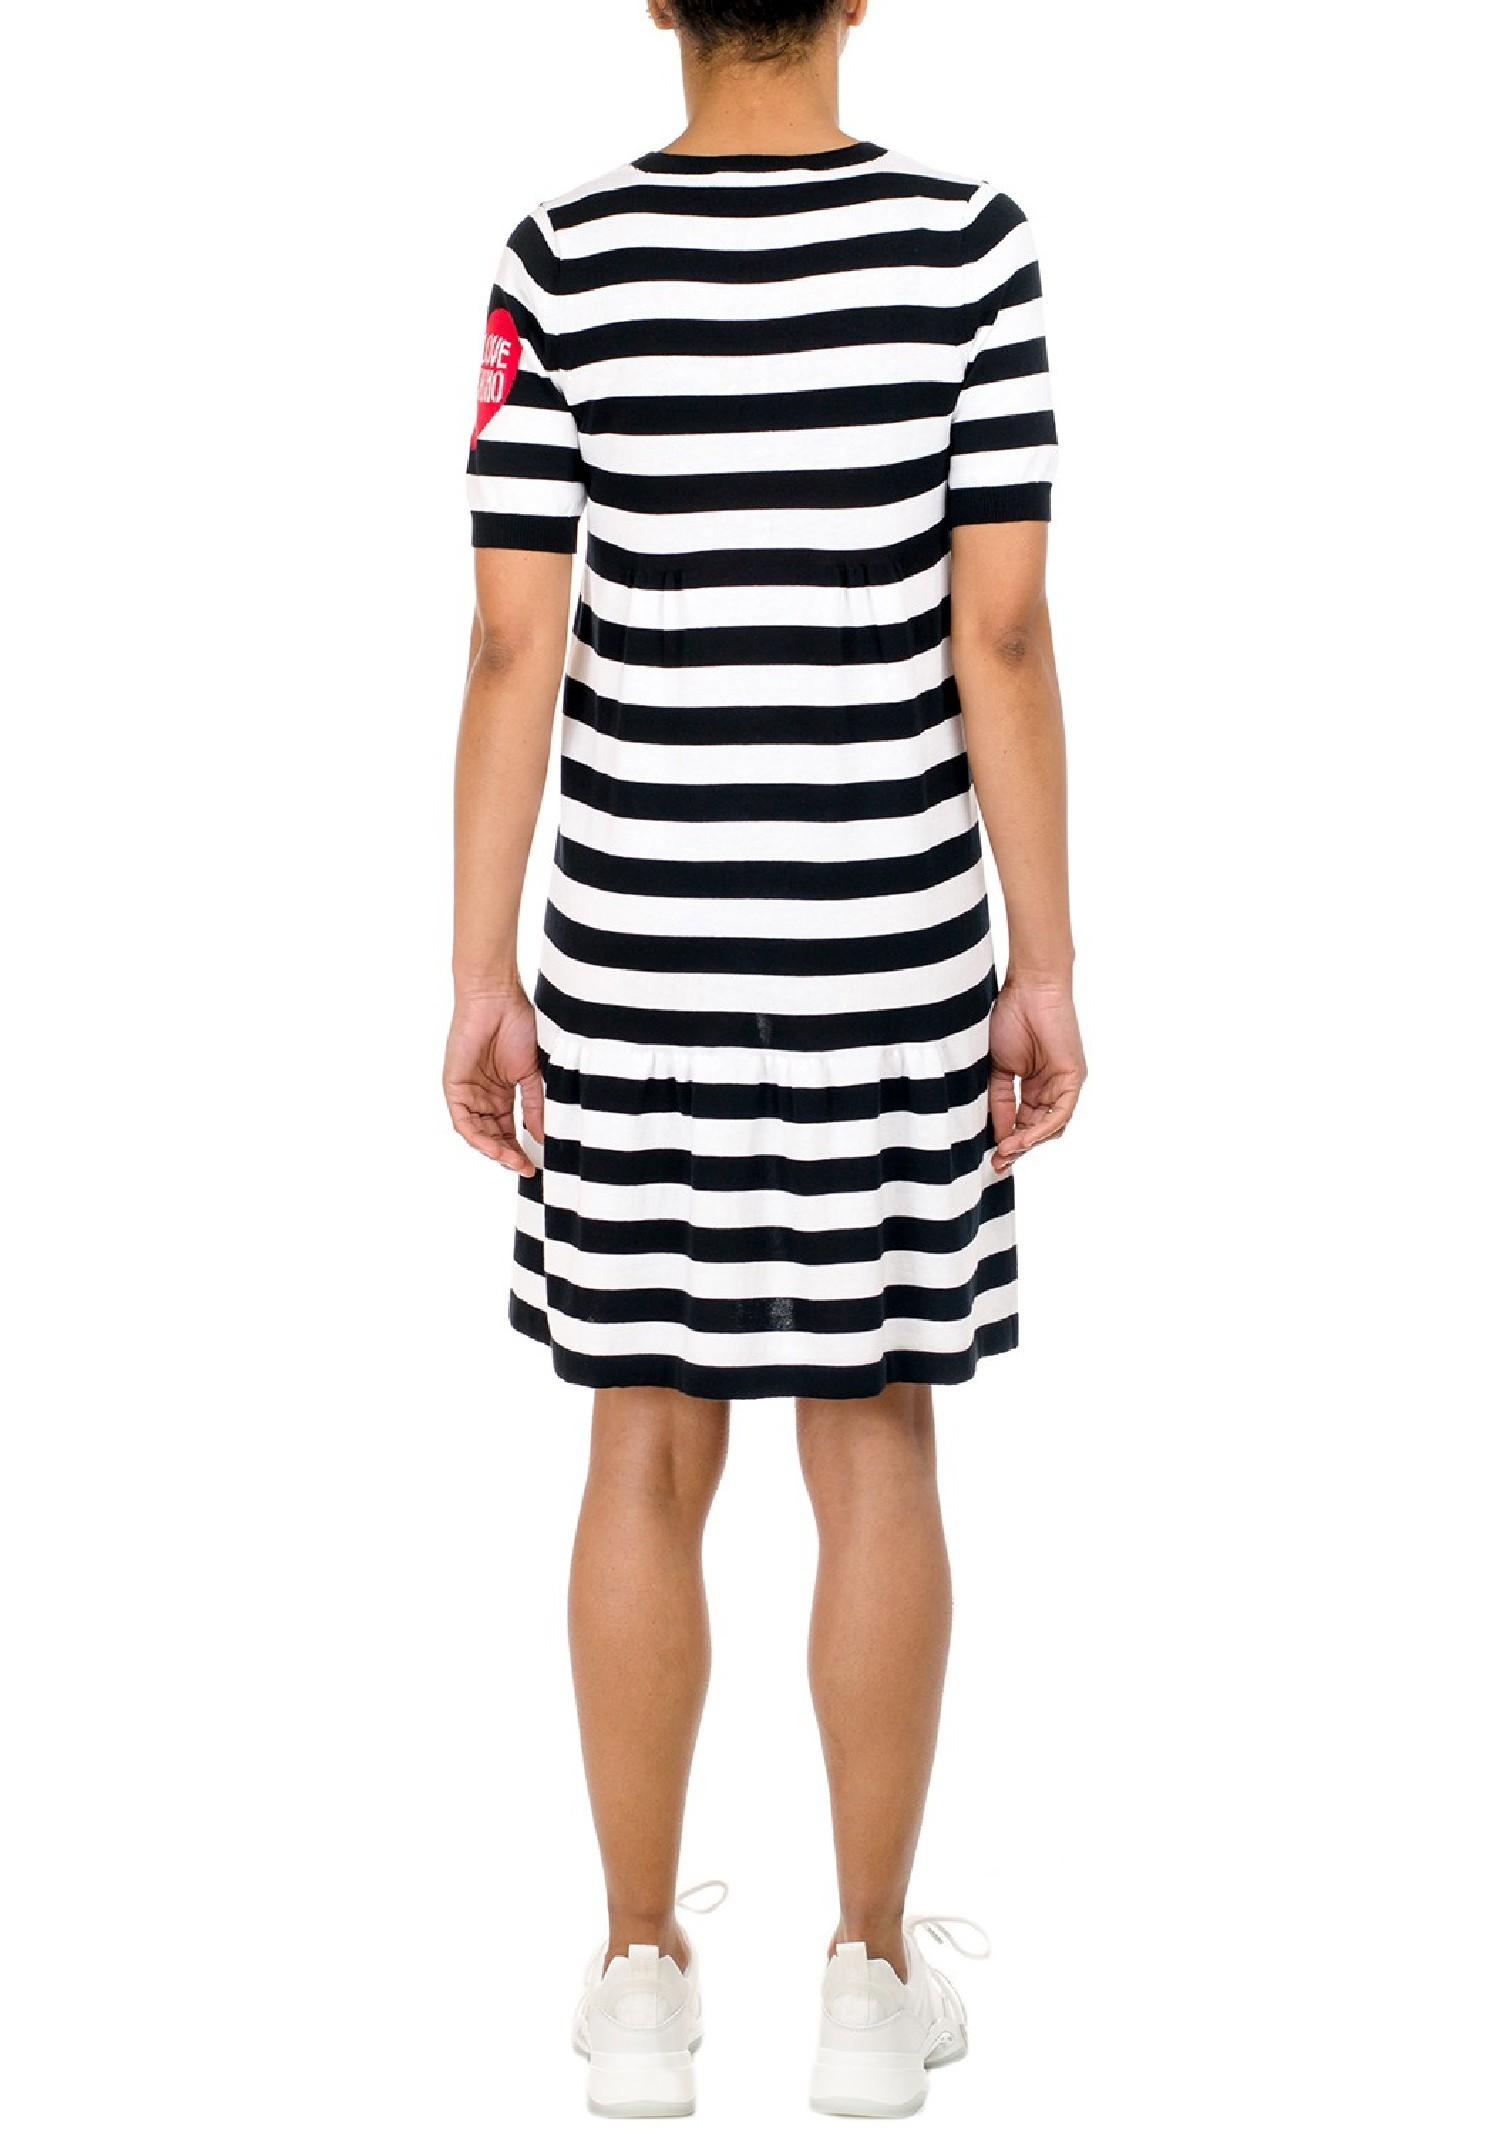 MOSCHINO LOVE | Dress | W S 41R 10 X 1404C74